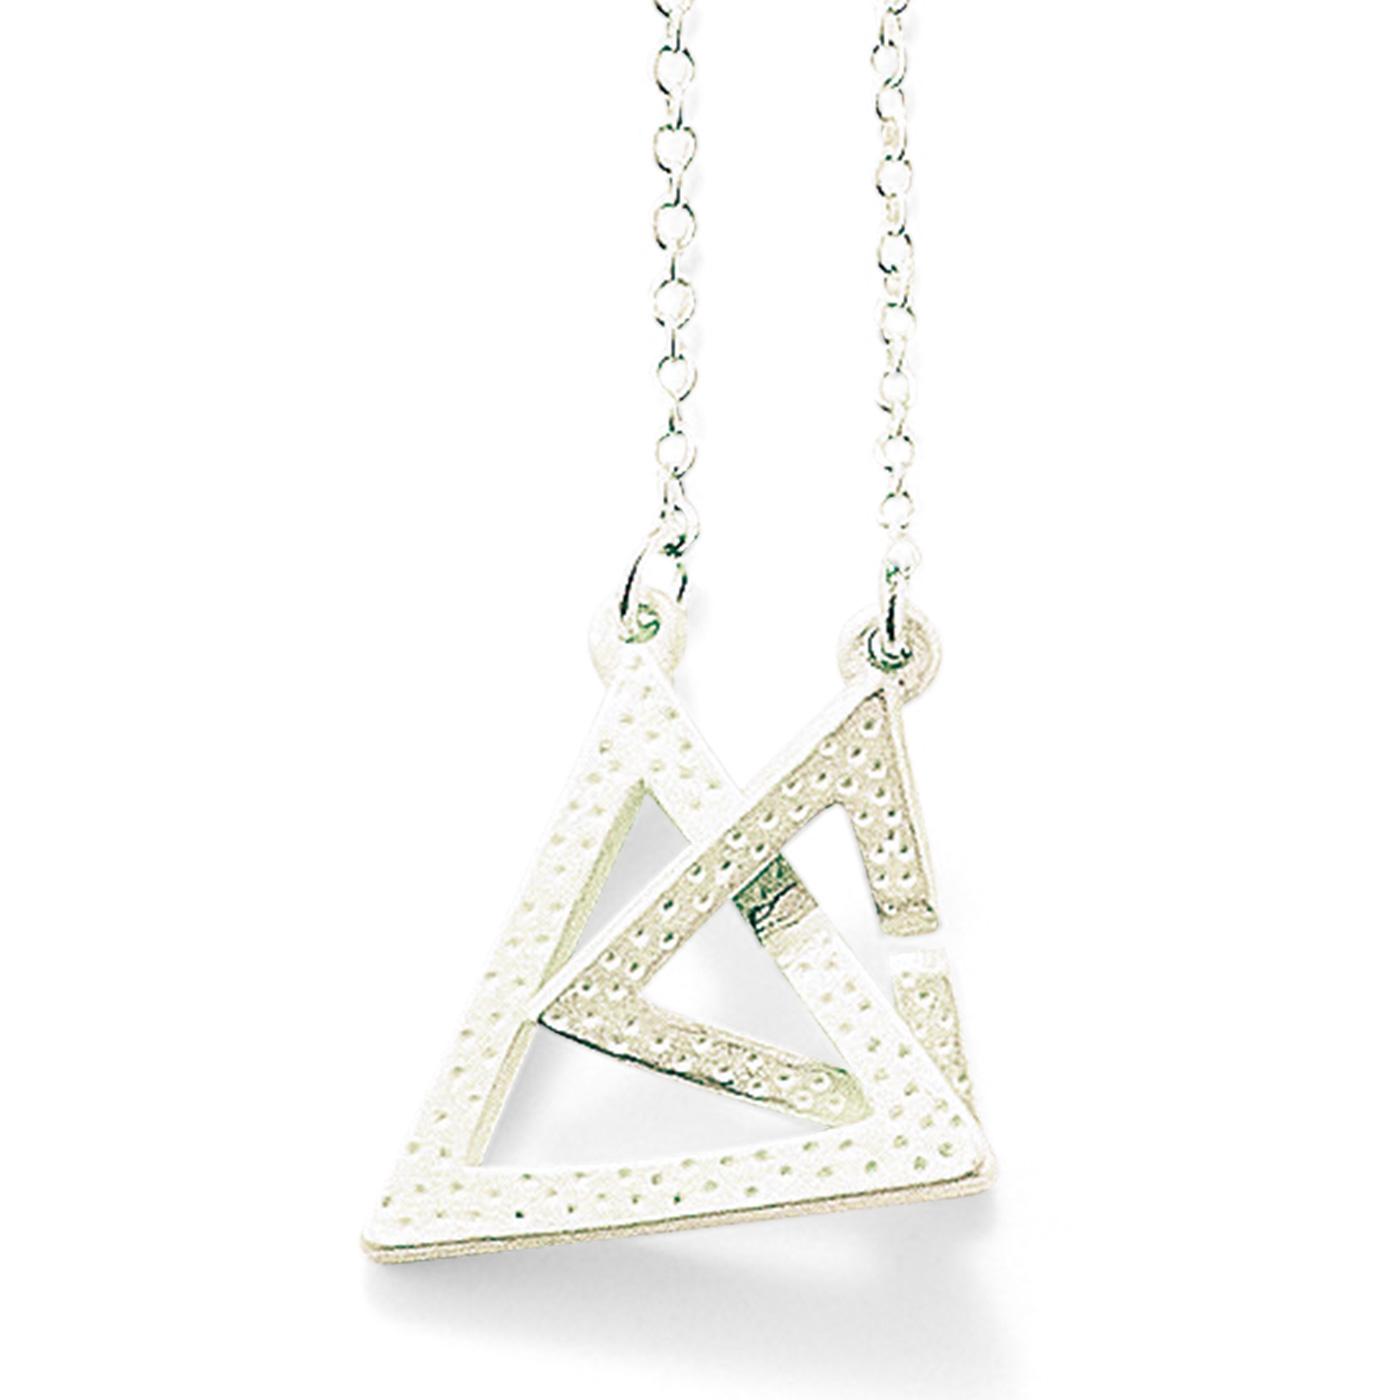 triangle モチーフ同士を知恵の輪のようにつなぐ留め具です。